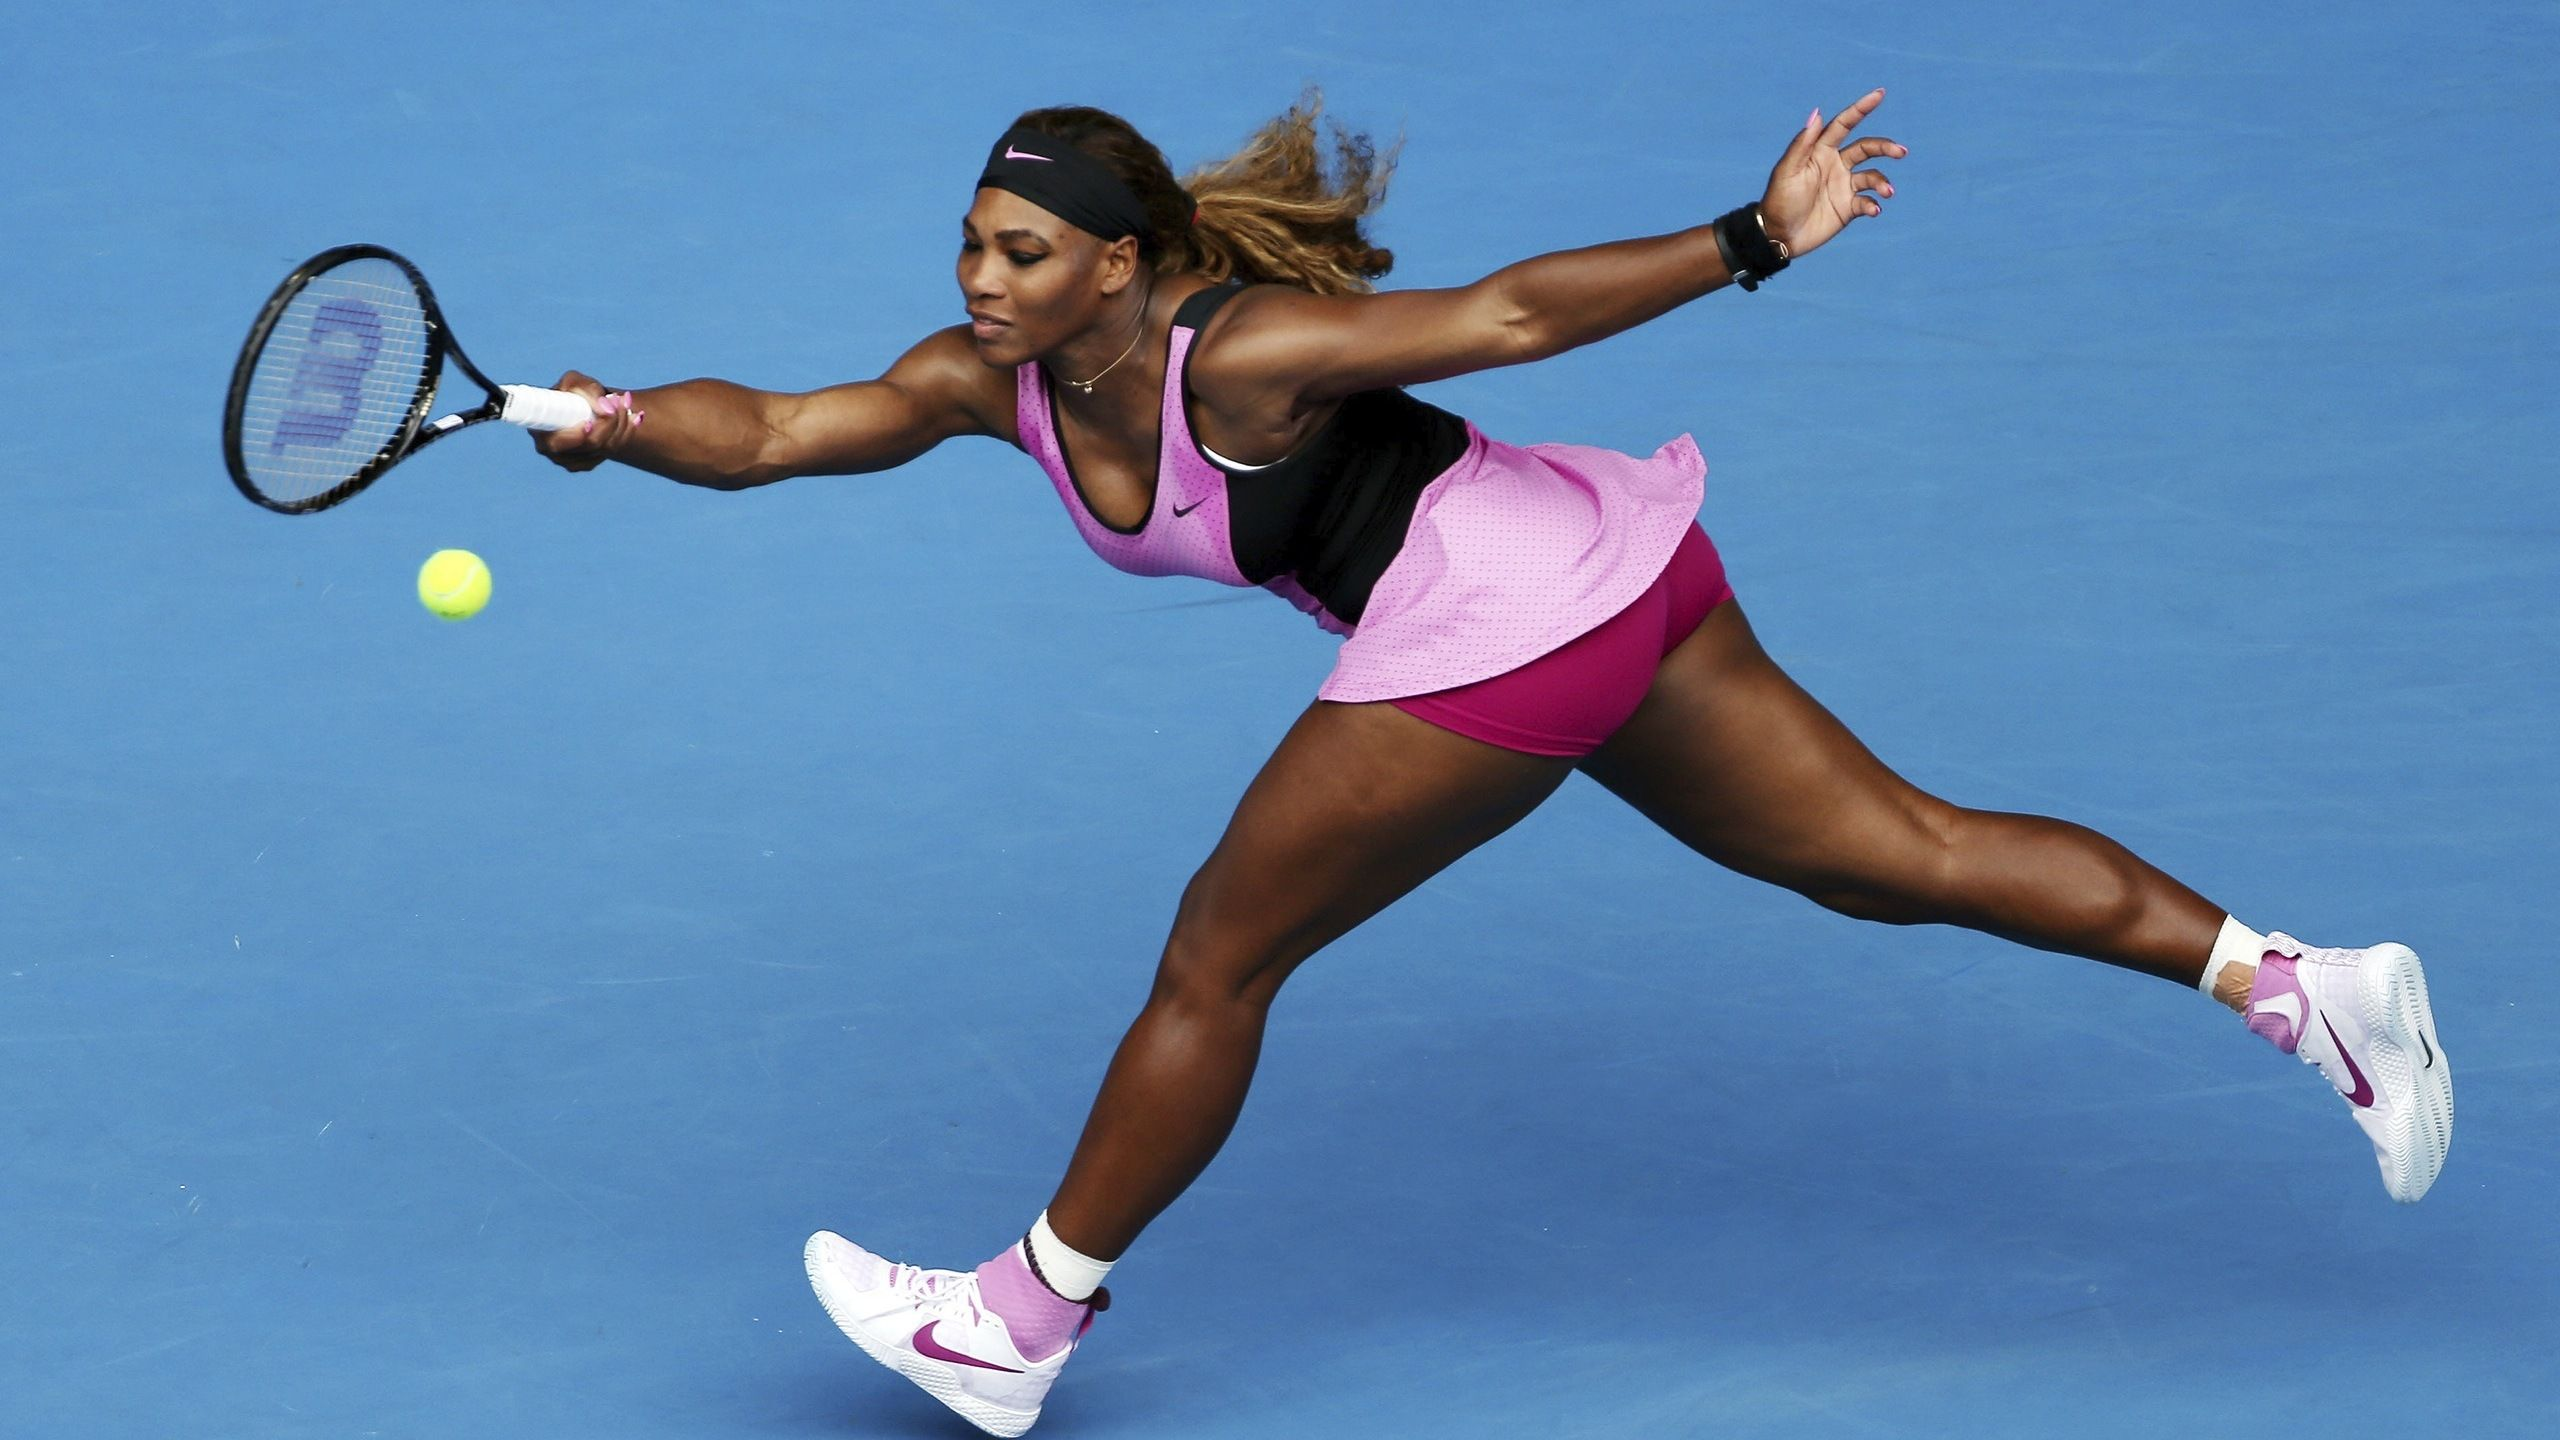 Serena Williams Wallpaper 17   2560 X 1440 stmednet 2560x1440